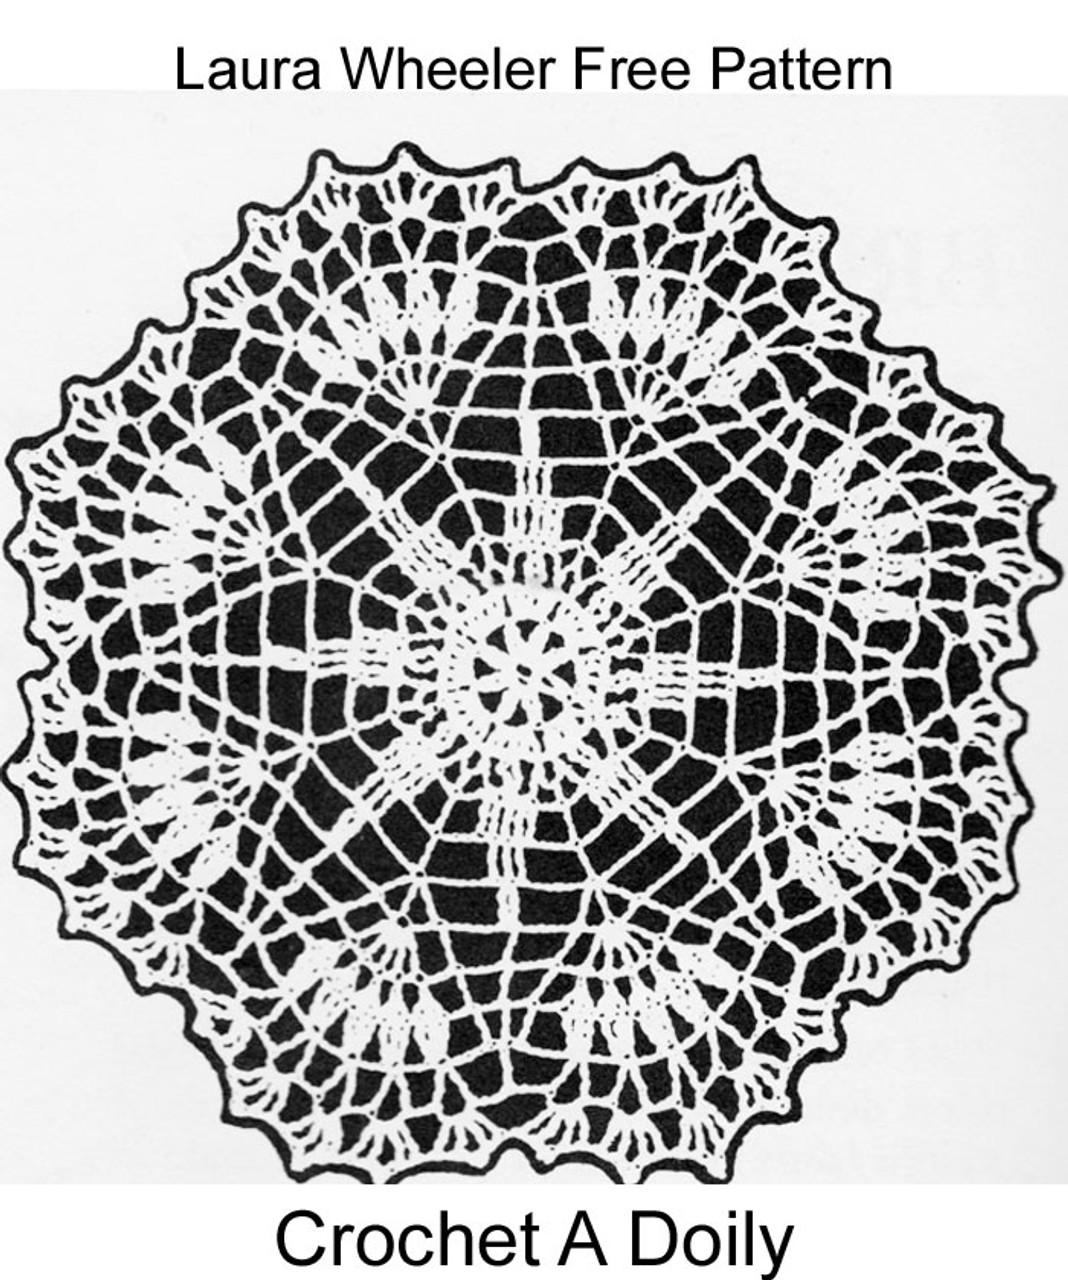 Free Crochet Star Doily pattern, Laura Wheeler